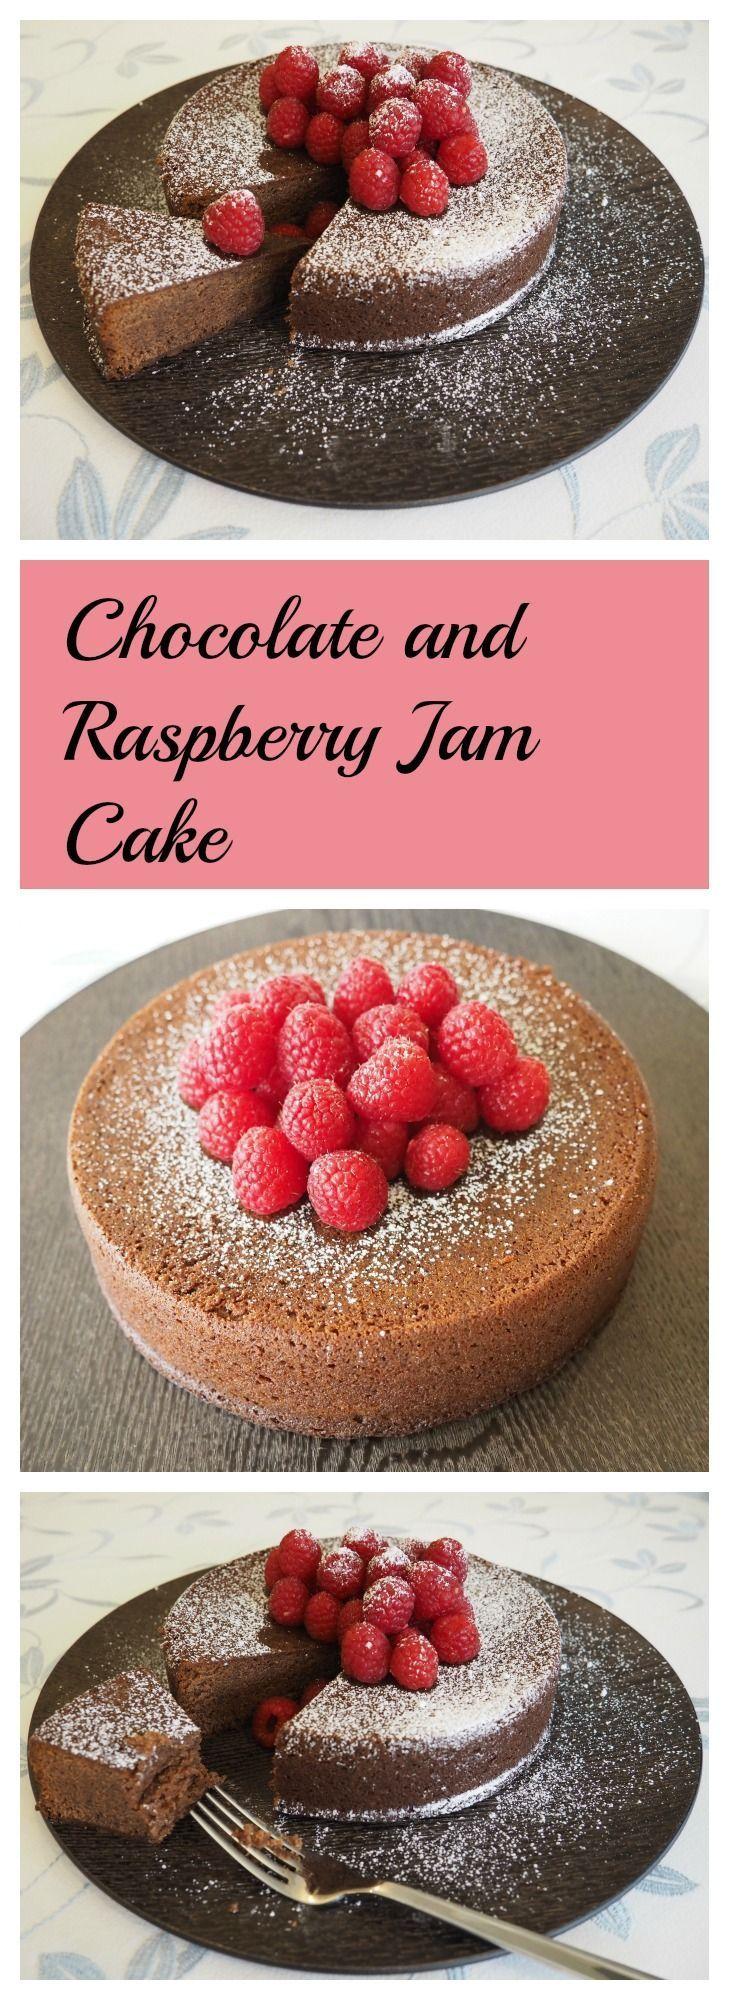 Chocolate Raspberry Cake With Jam